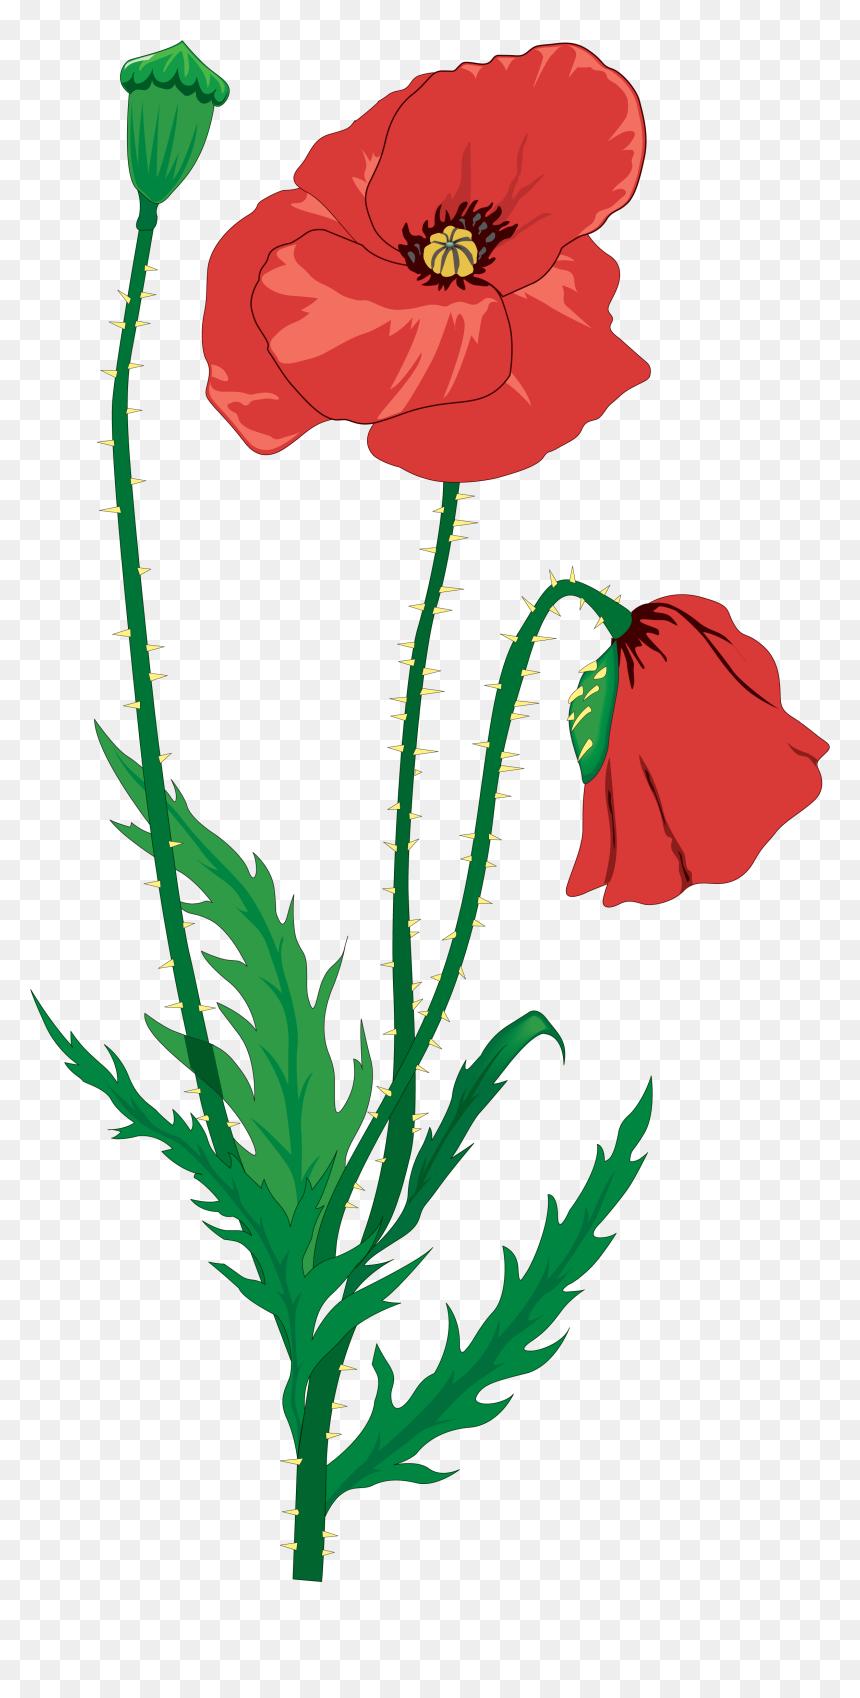 Poppy Remembrance Day Clip Art | Remembrance day art, Poppy drawing, Remembrance  day poppy